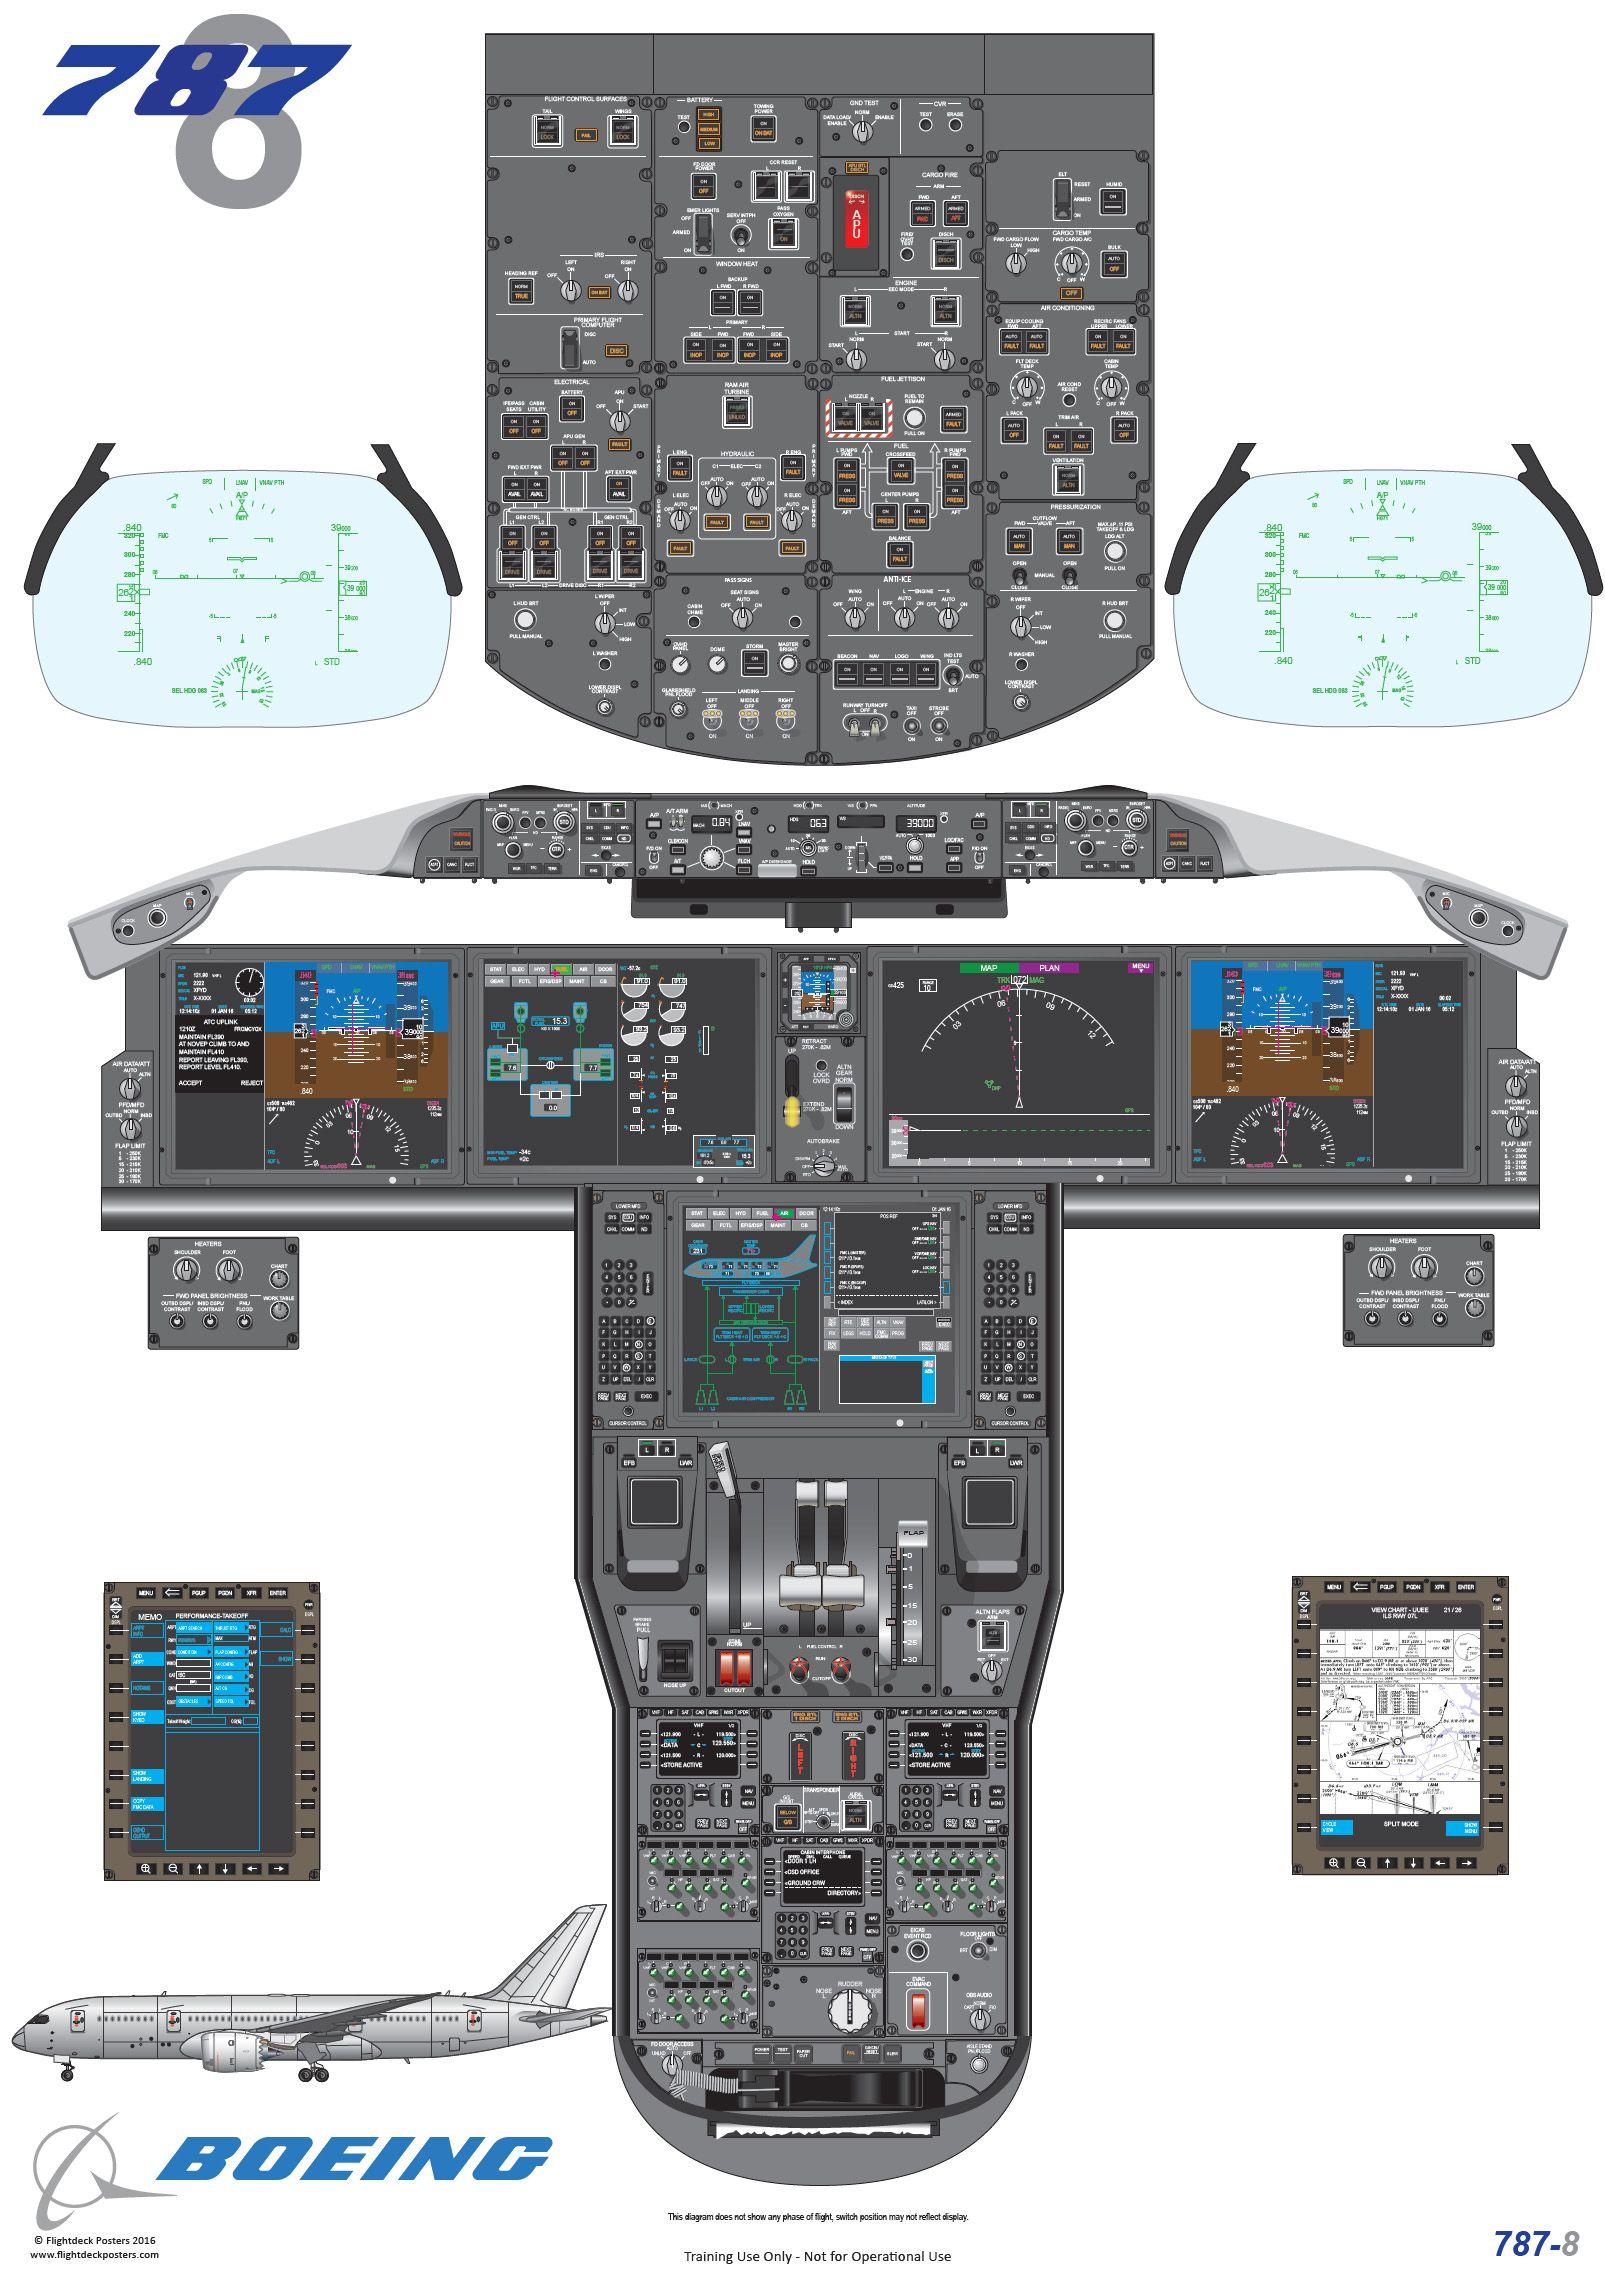 medium resolution of boeing 787 8 cockpit diagram used for training pilots